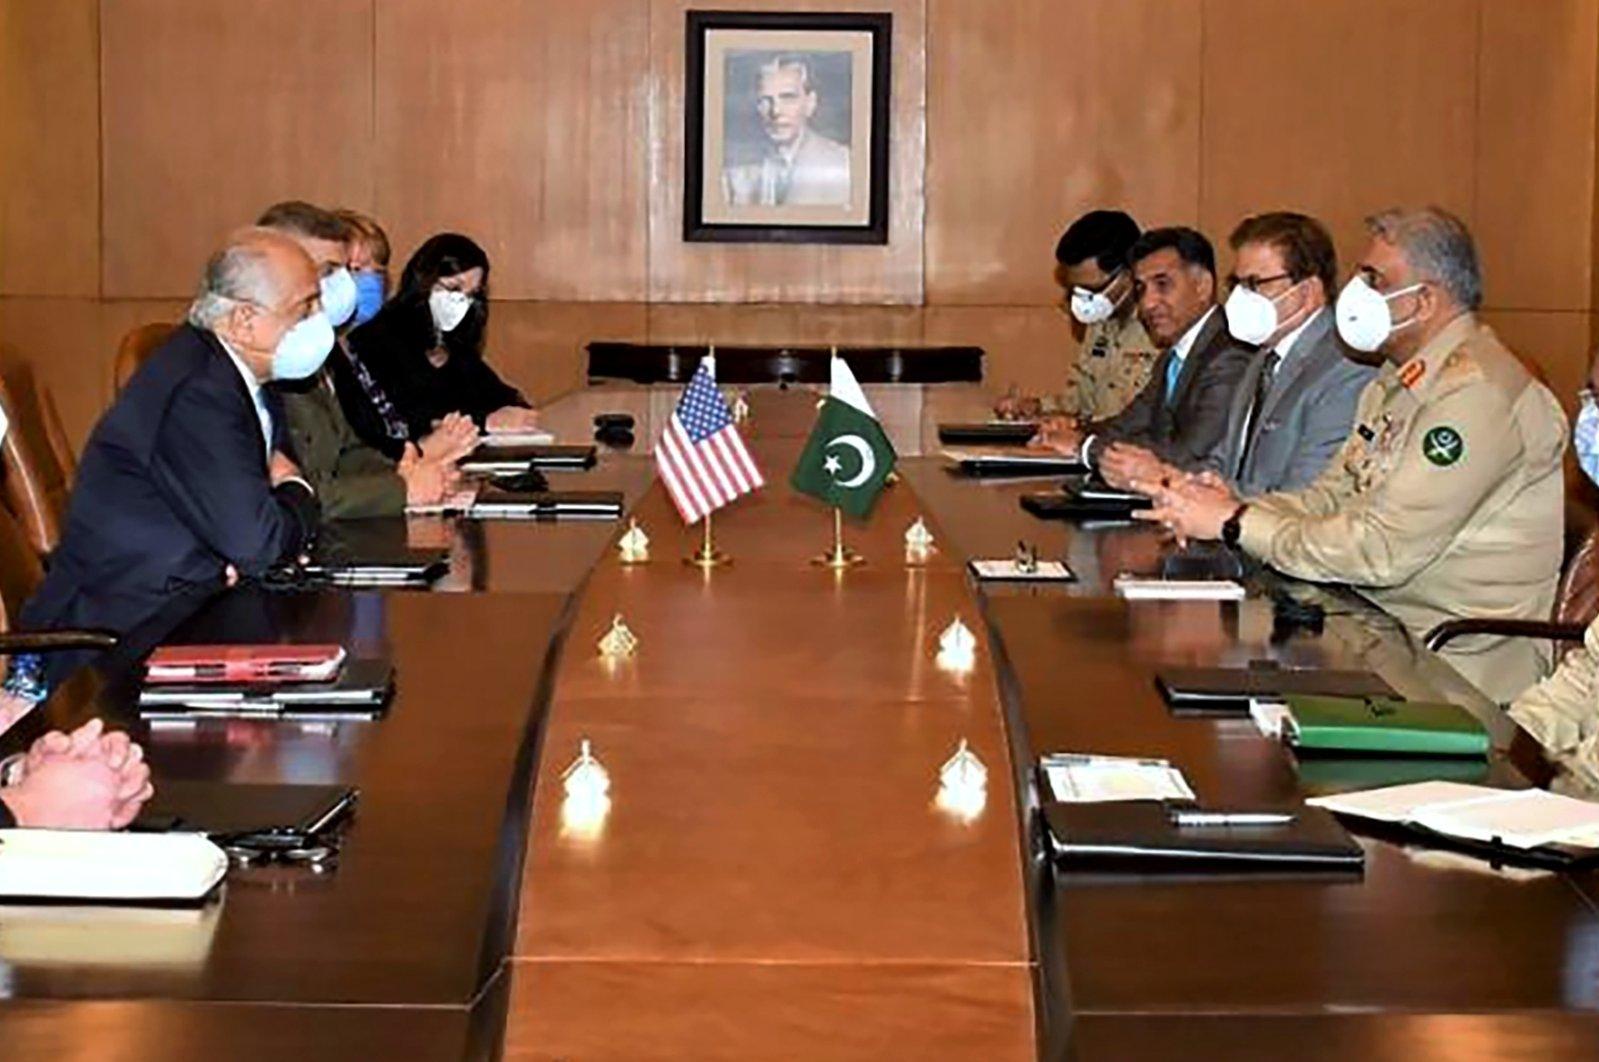 A U.S. delegation headed by peace envoy for Afghanistan, Zalmay Khalilzad (3rd L) hold talks with Pakistan's army chief, Gen. Qamar Javed Bajwa, (2nd R), Rawalpindi, northeastern Pakistan, Sept. 14, 2020. (AP Photo)